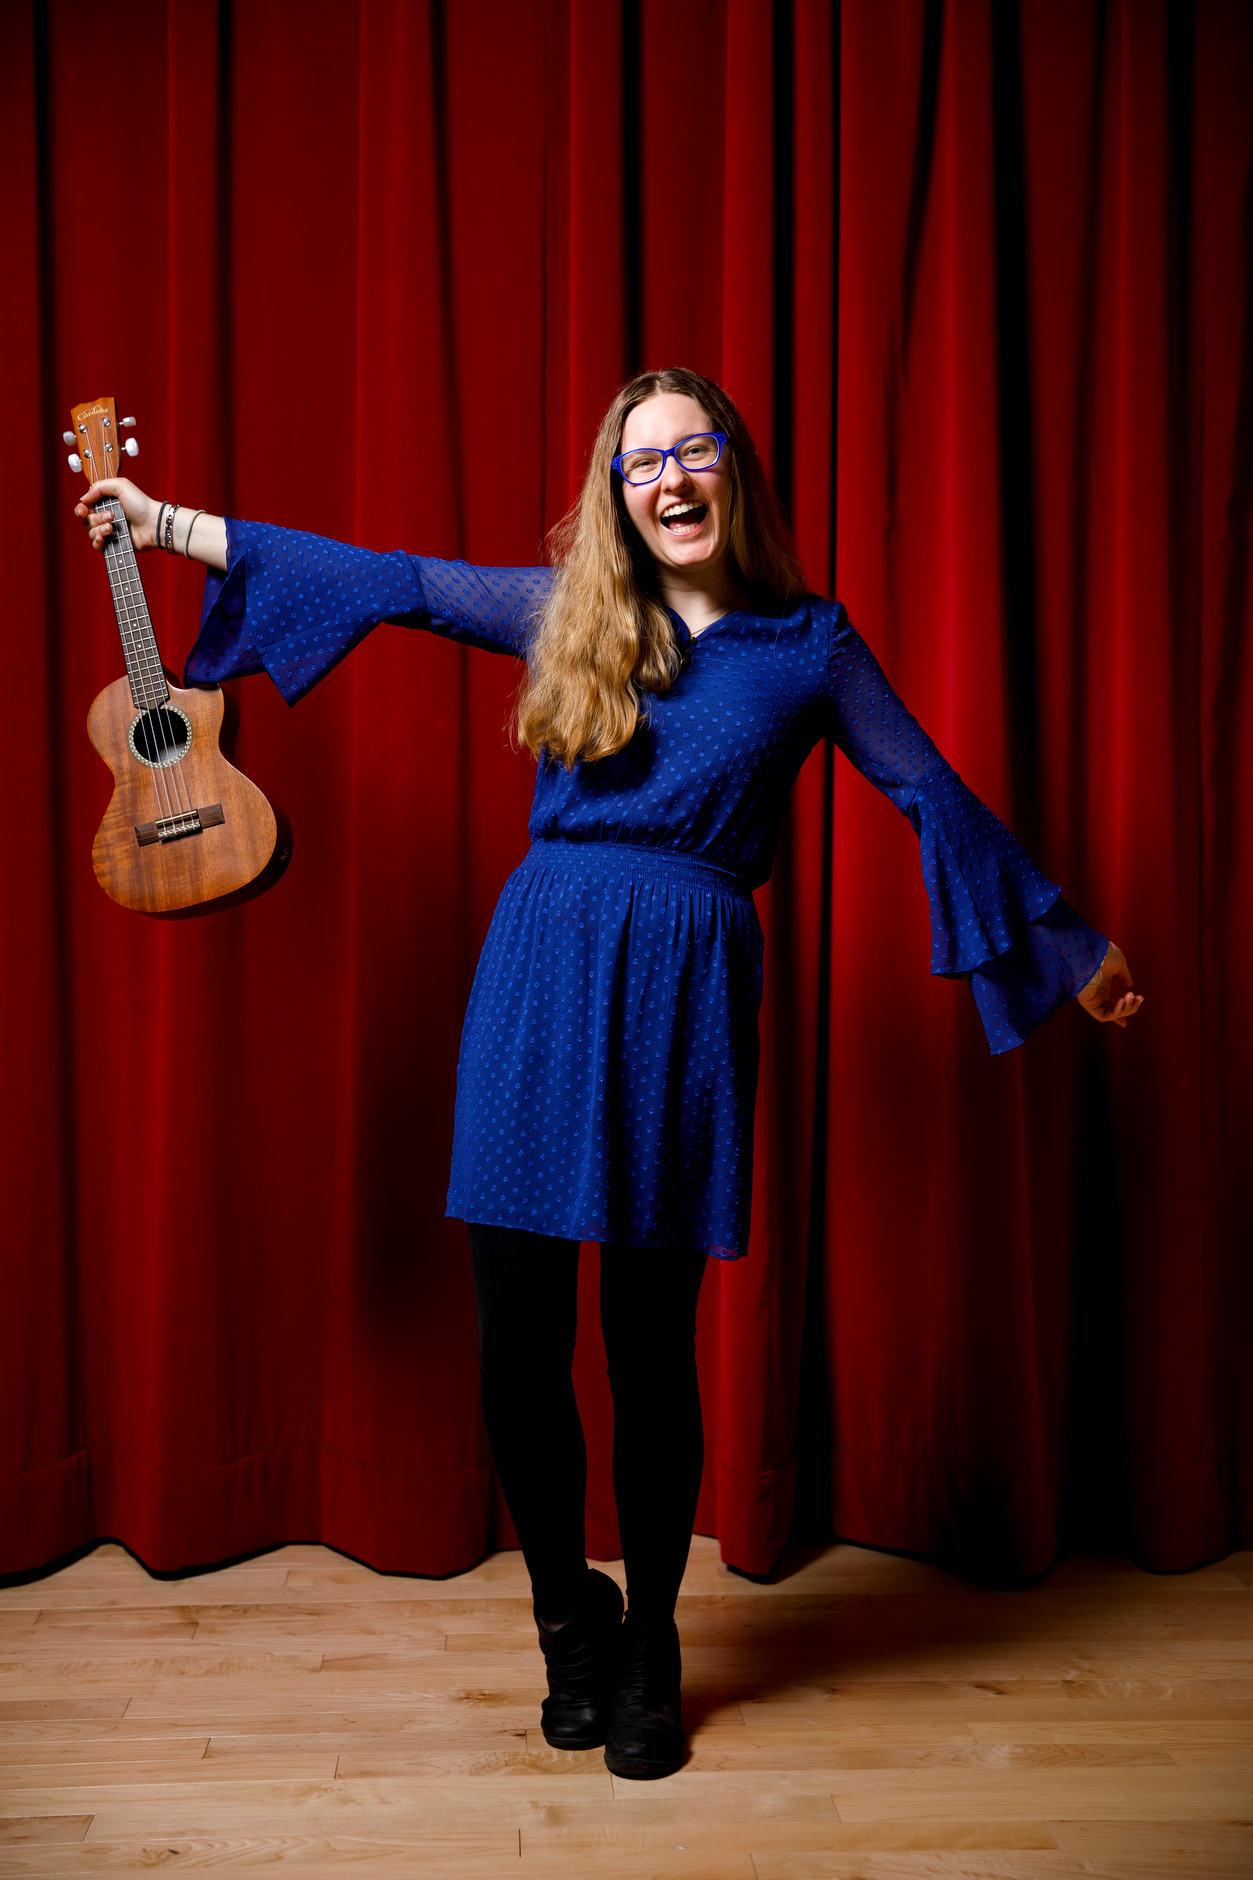 Indiana University student musician Grace Minnick – Bloomington, Indiana – April 19, 2018. (Photo by James Brosher)